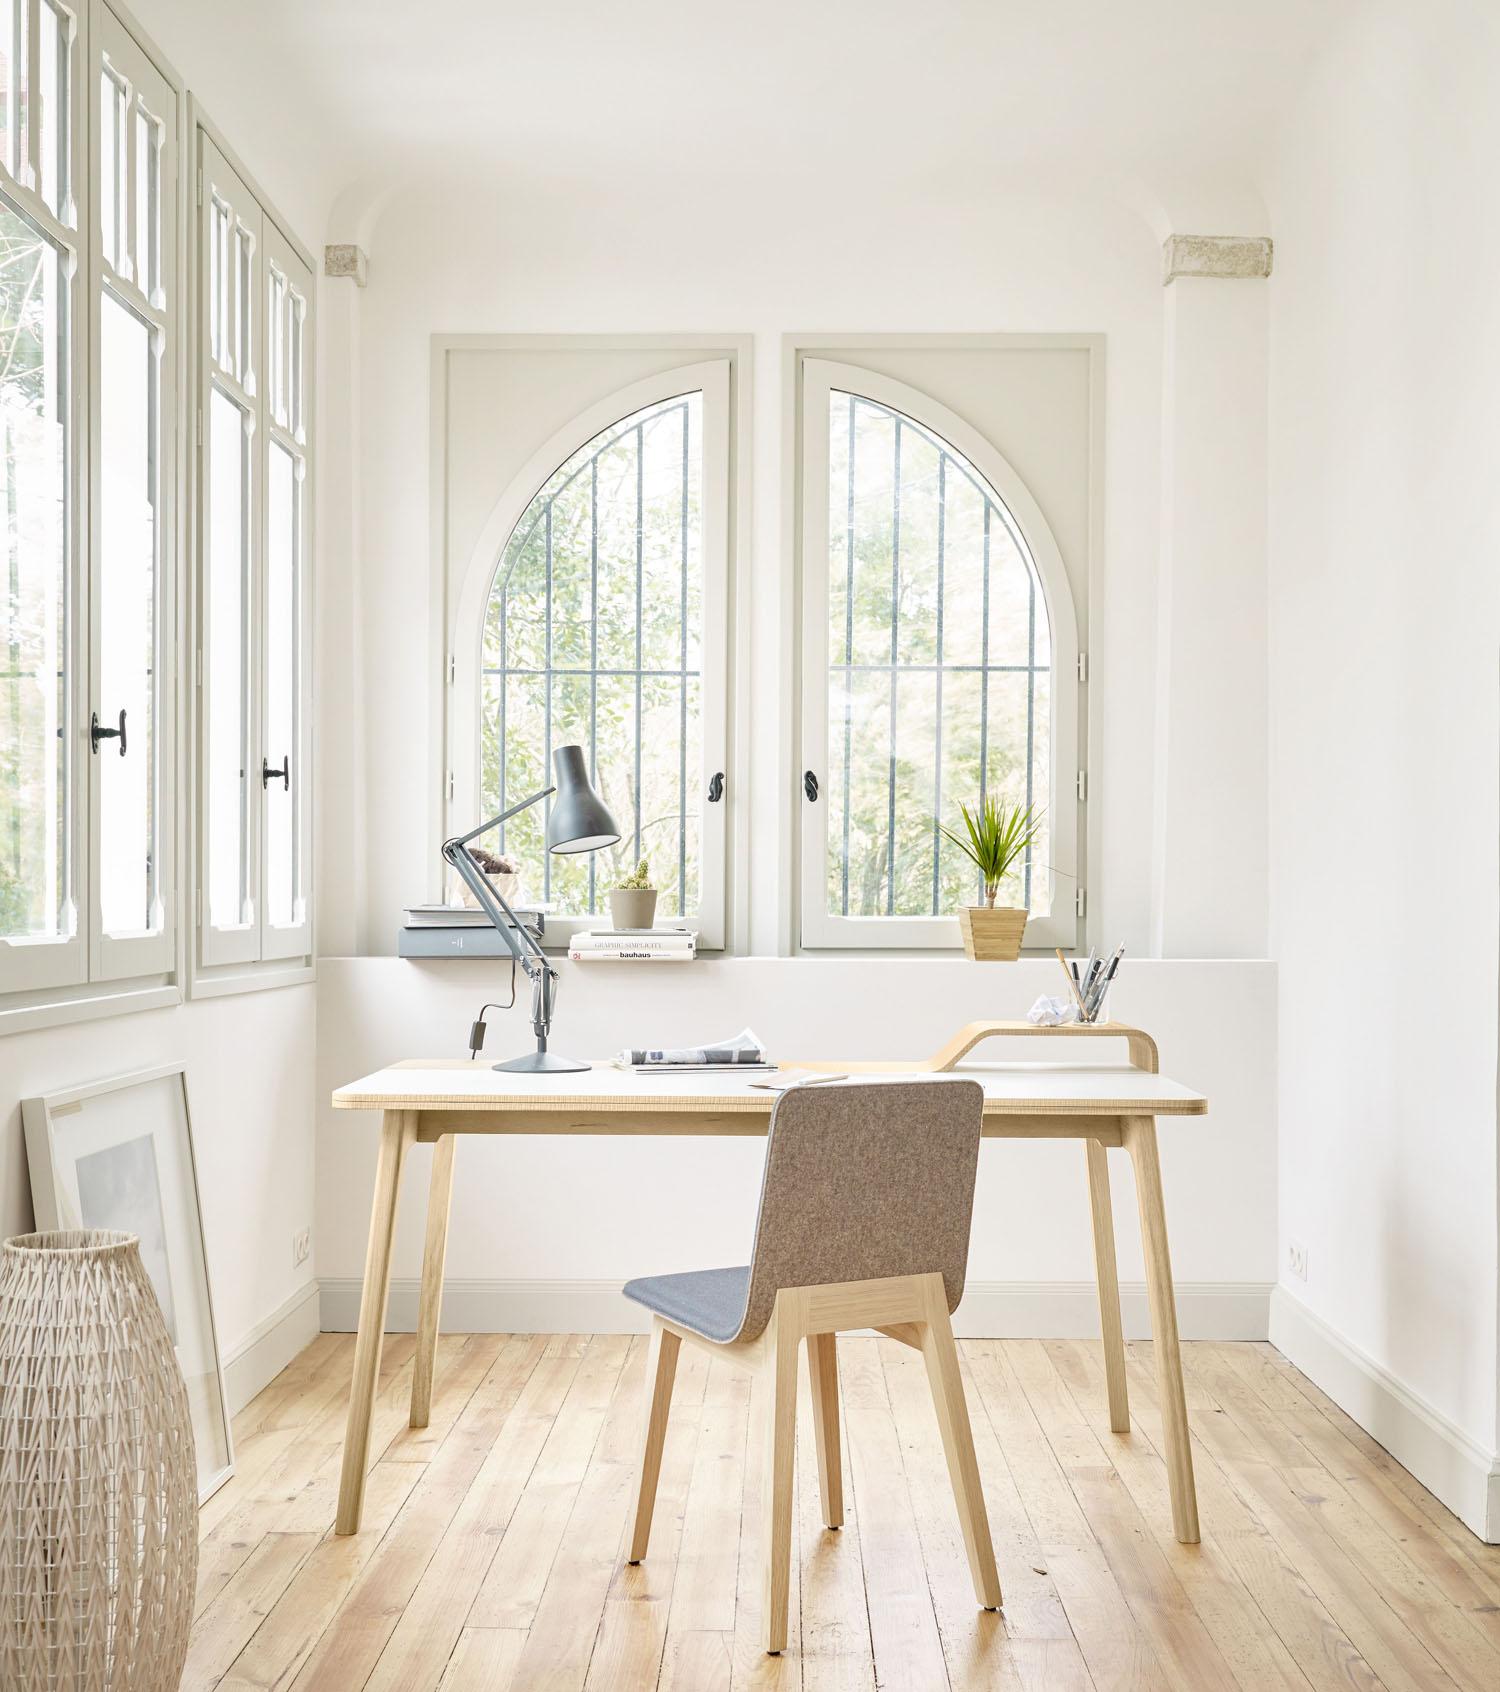 Top 5 Furniture Brands at Maison et Objet 2017 furniture brands Top 5 Furniture Brands at Maison et Objet 2017 Treku Belharra 61